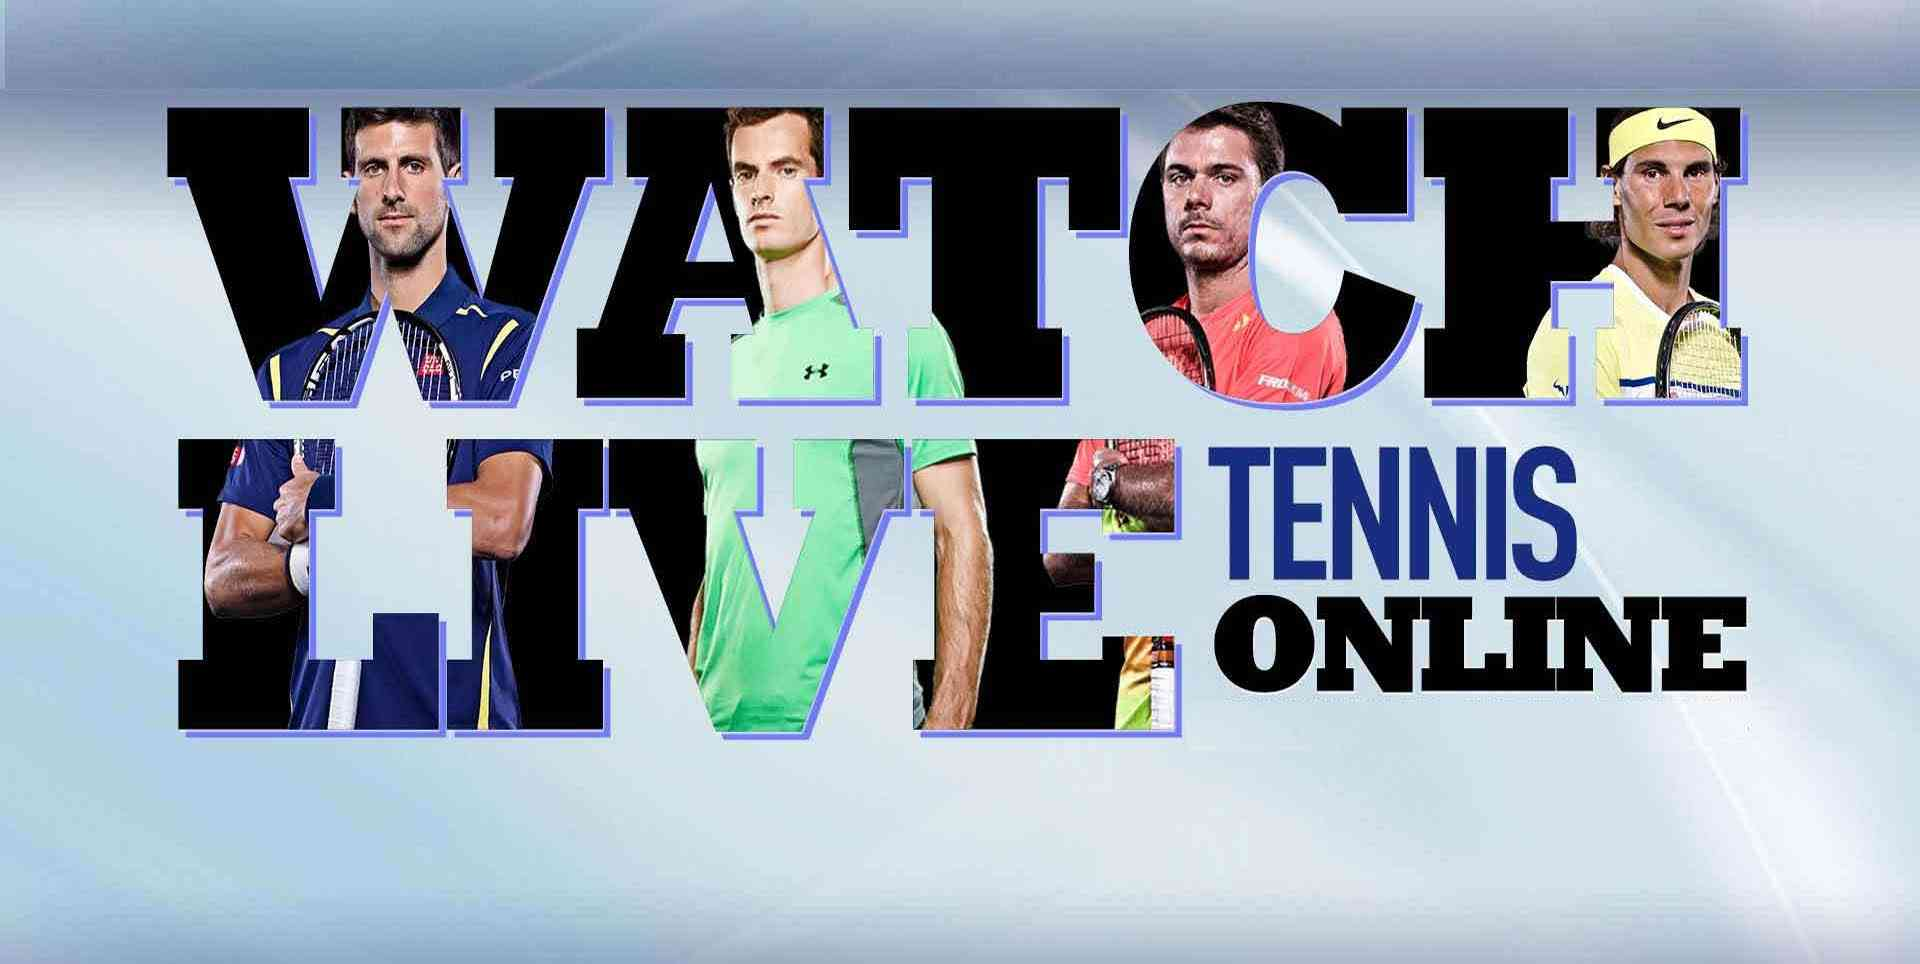 Watch A. Peya   B. Soares vs D. Marrero   F. Verdasco Quarterfinals Online 2013